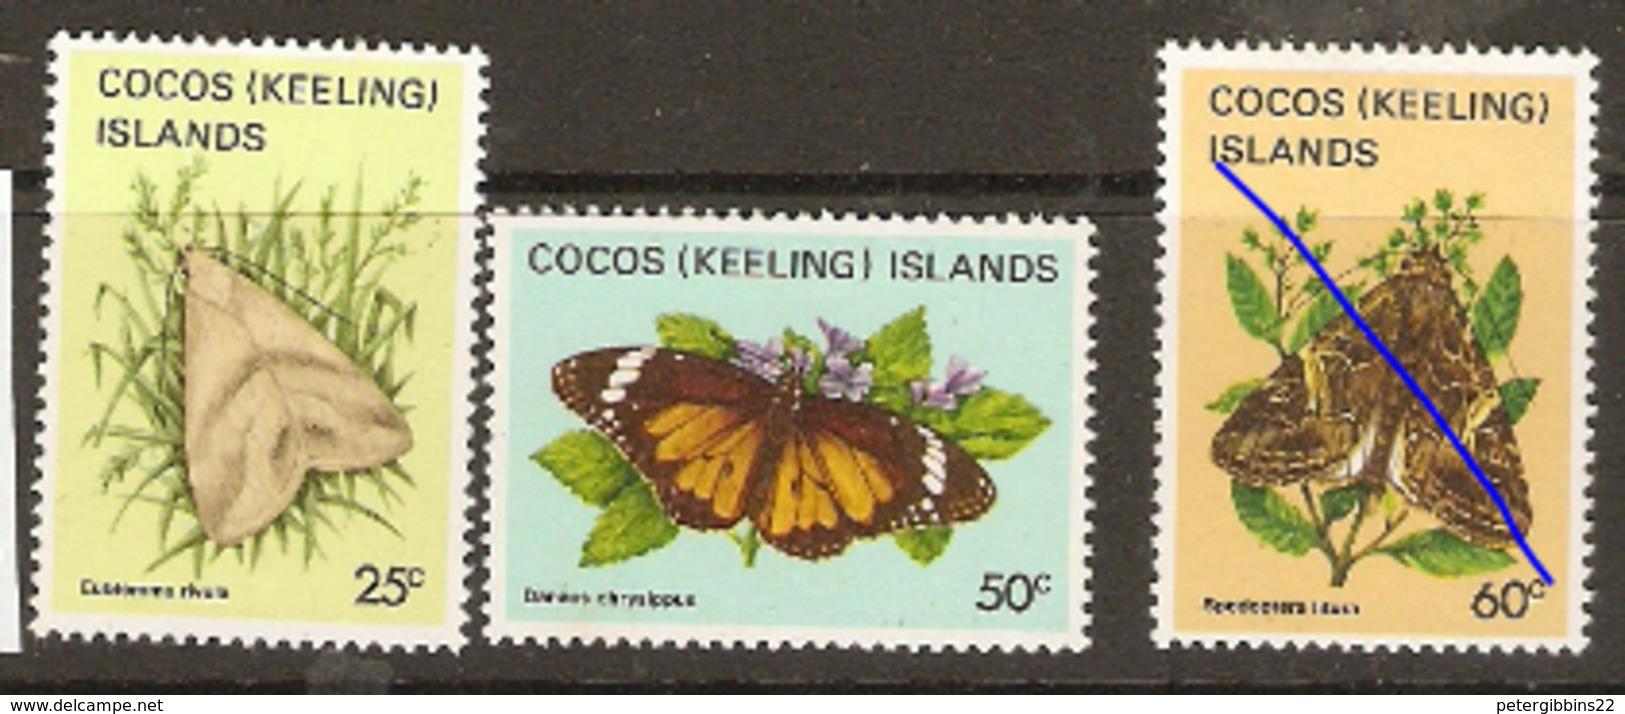 Cocos Keeling Islands  1982  SG 89,94,6  Moths  Unmounted Mint - Cocos (Keeling) Islands